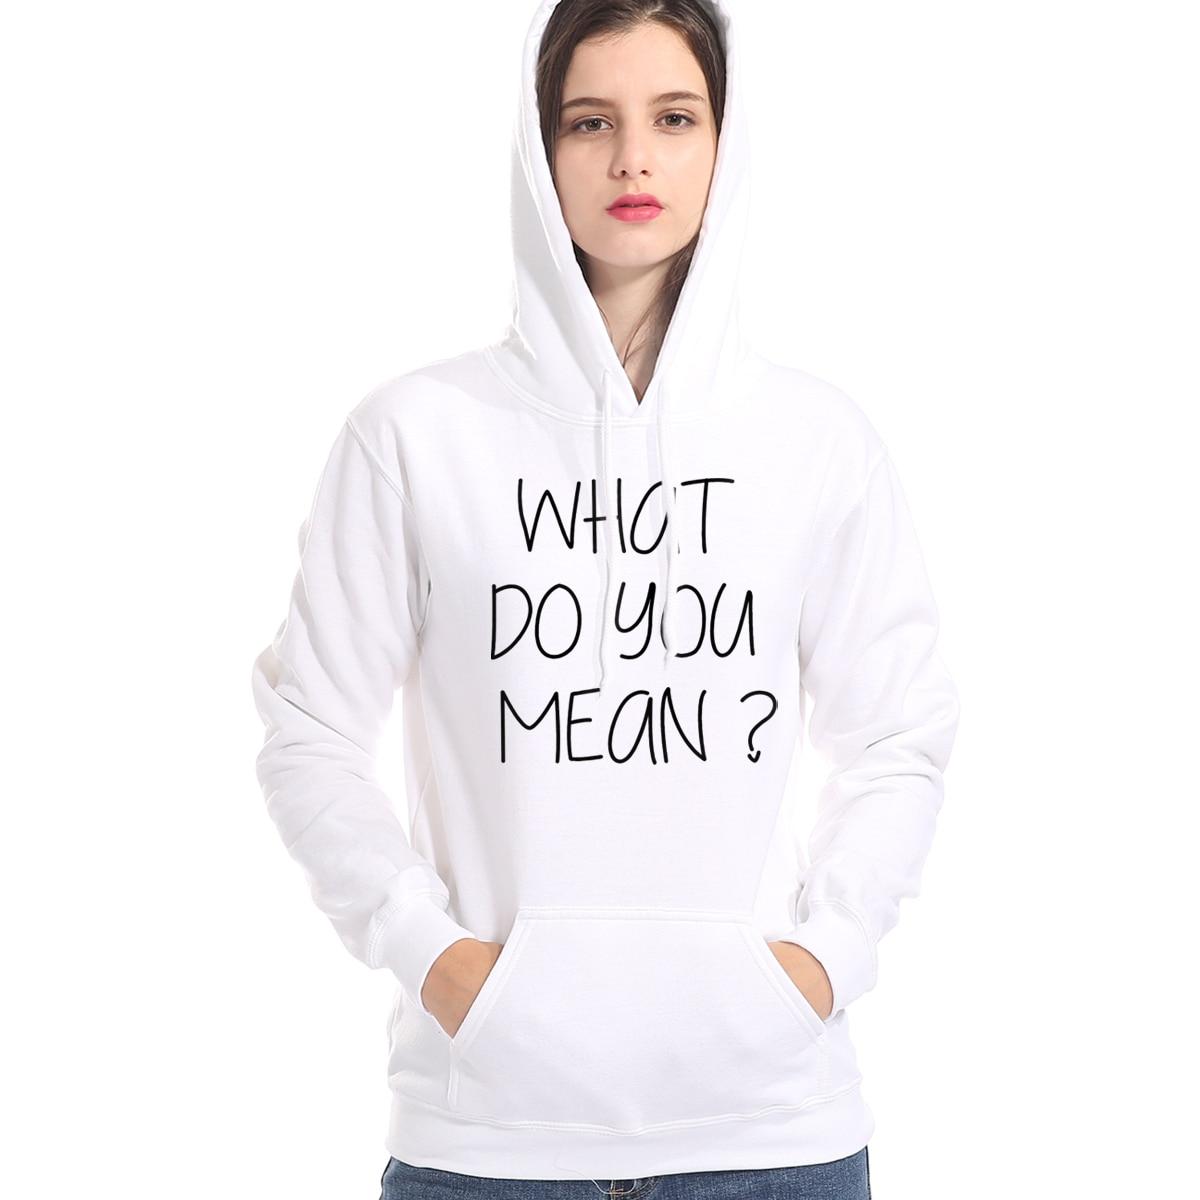 WHAT DO YOU MEAN Funny Sweatshirt For Women 2019 Autumn Winter Fleece Hooded Hoodies Female Streetwear Hip Hop Women's Top Hoody